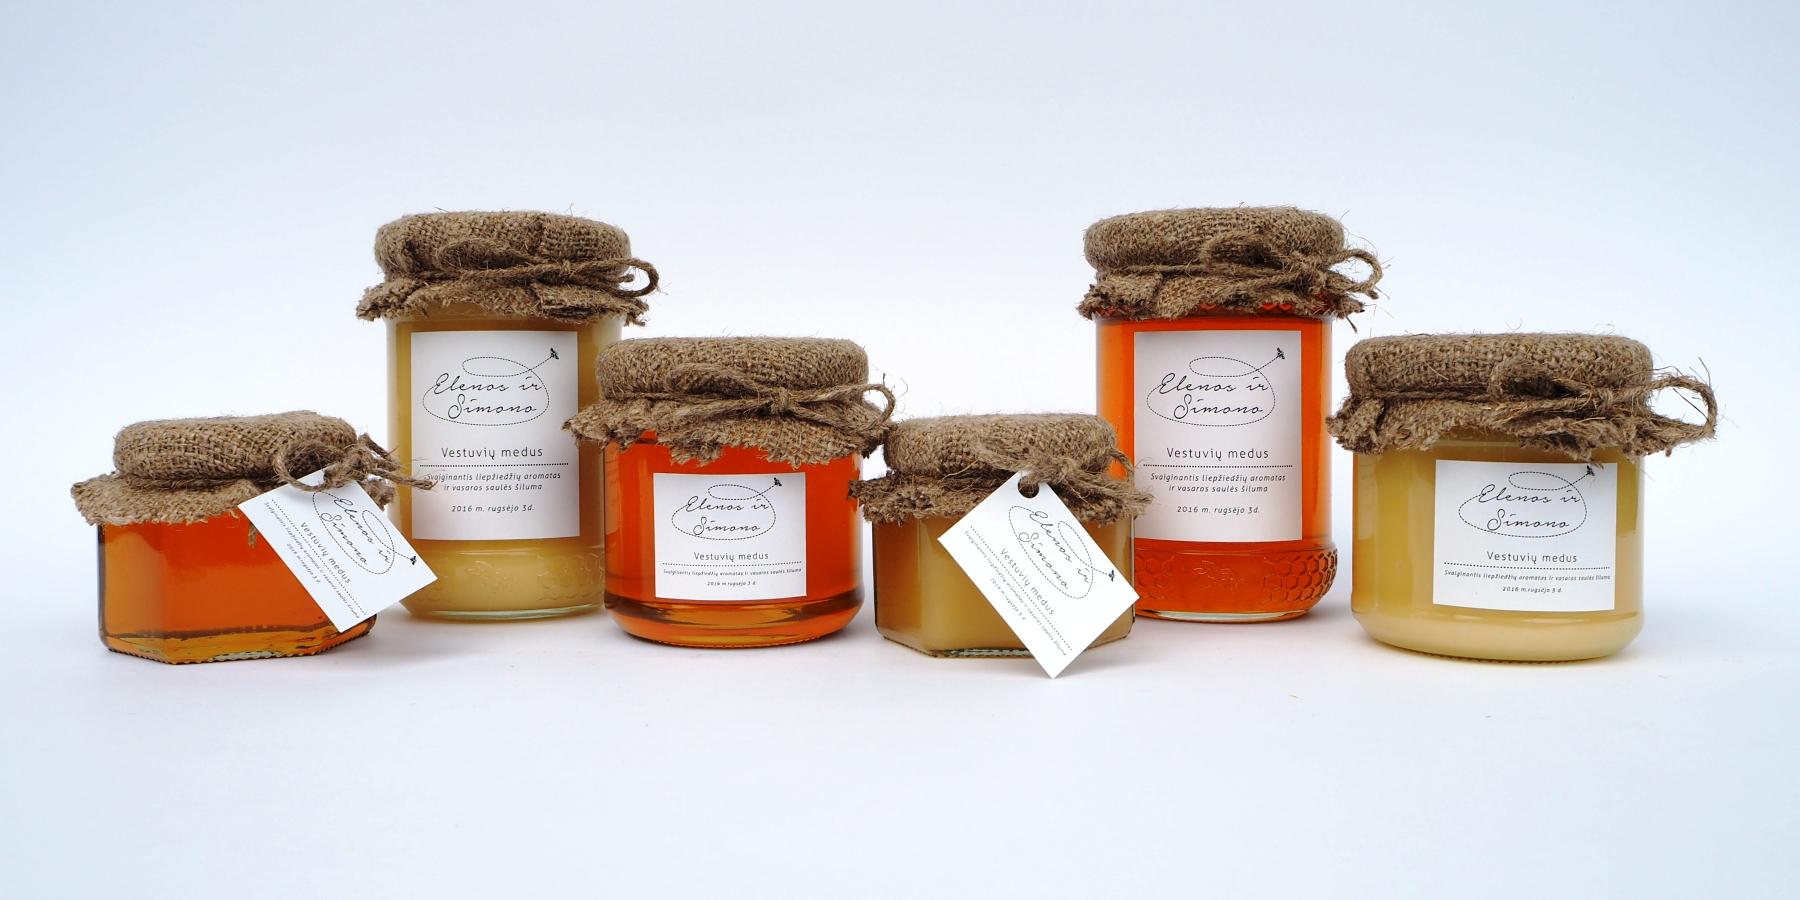 Medus – saldi dovana vestuvių svečiams